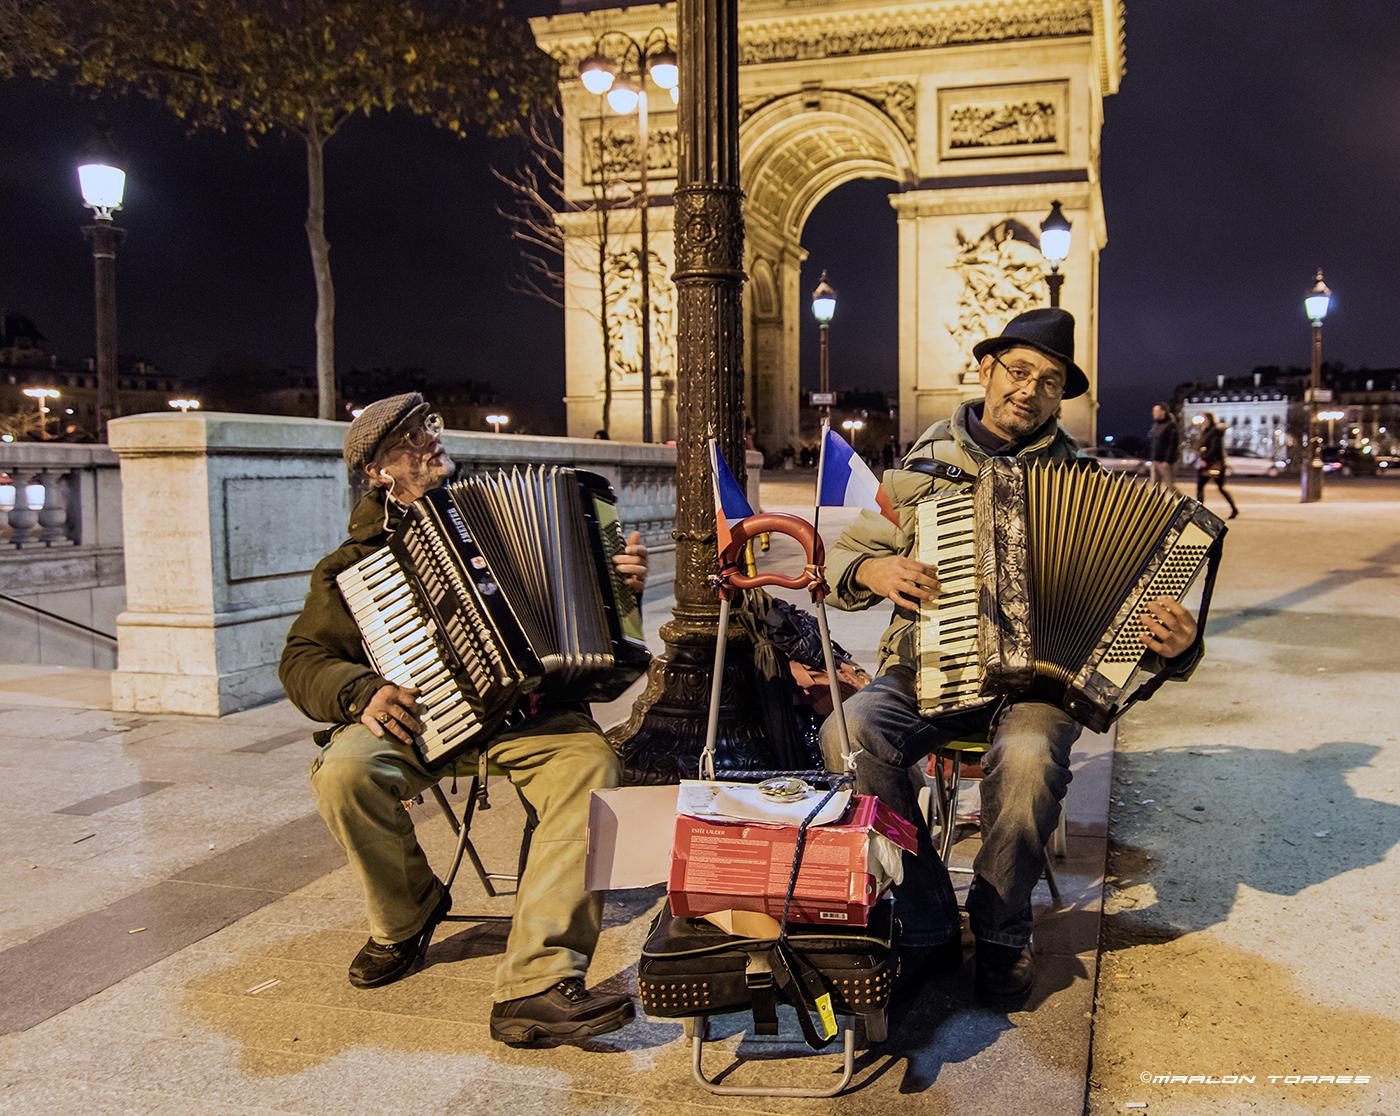 Frenchmen play La Vie en Rouge with their accordions. Photo: Marlon I. Torres